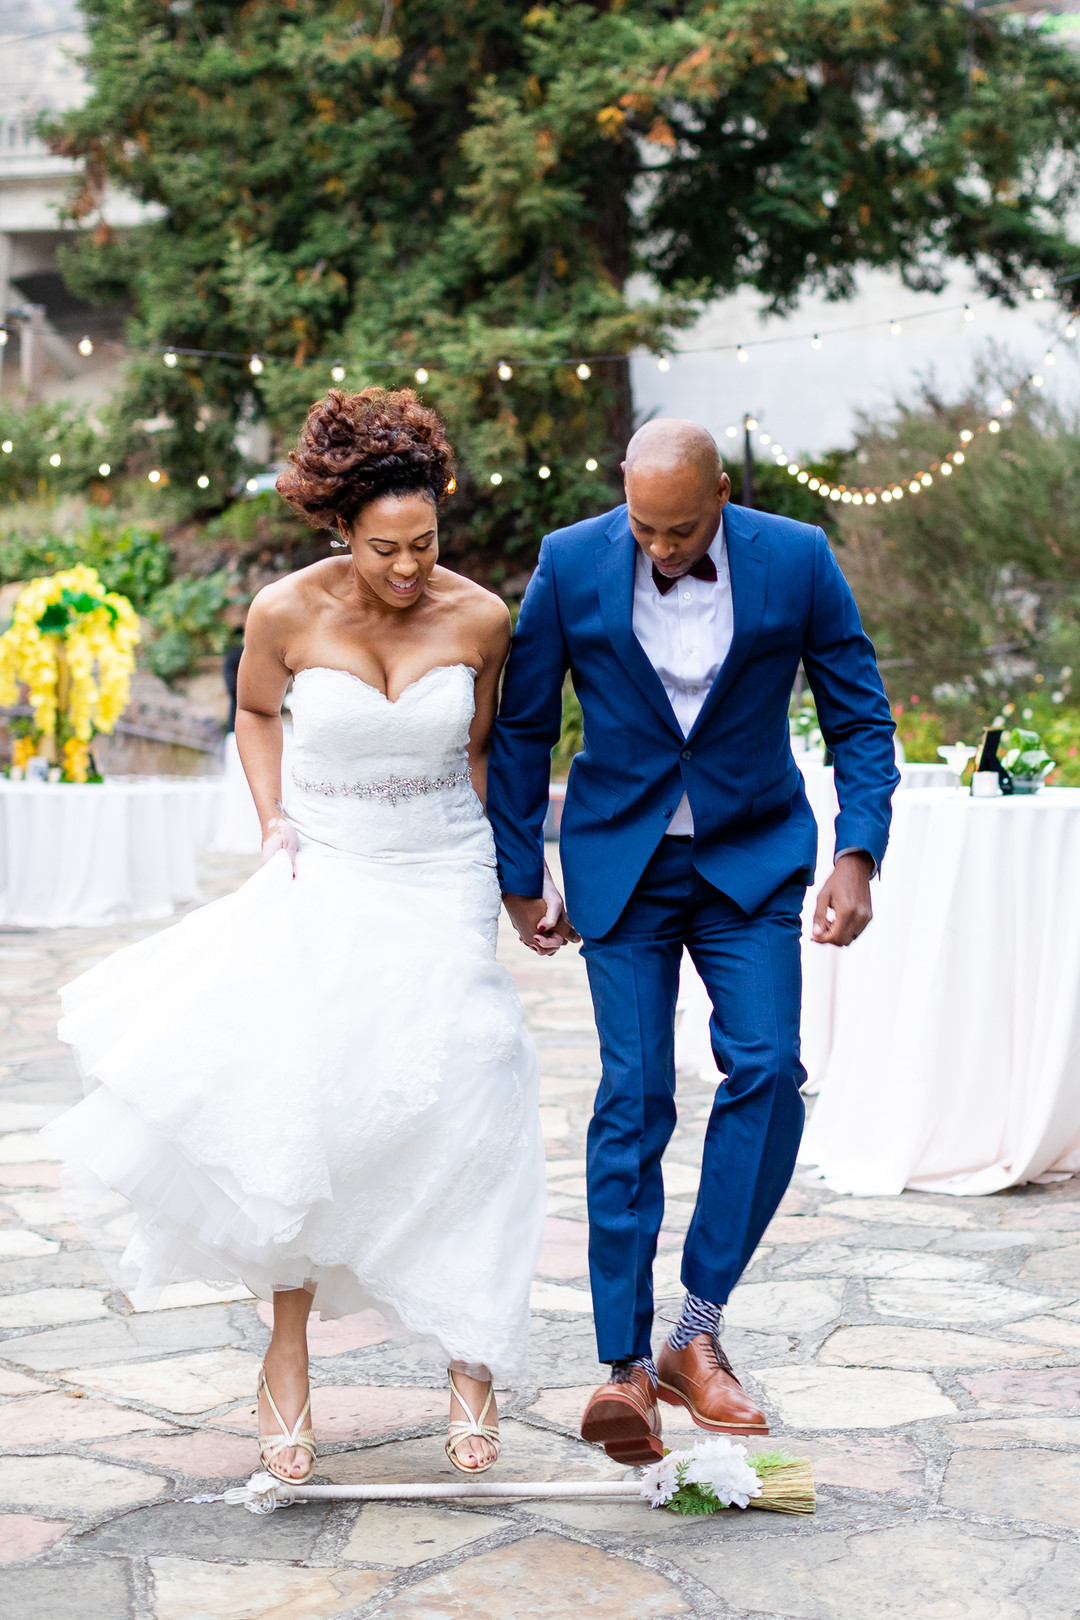 African American bride and groom jump the broom